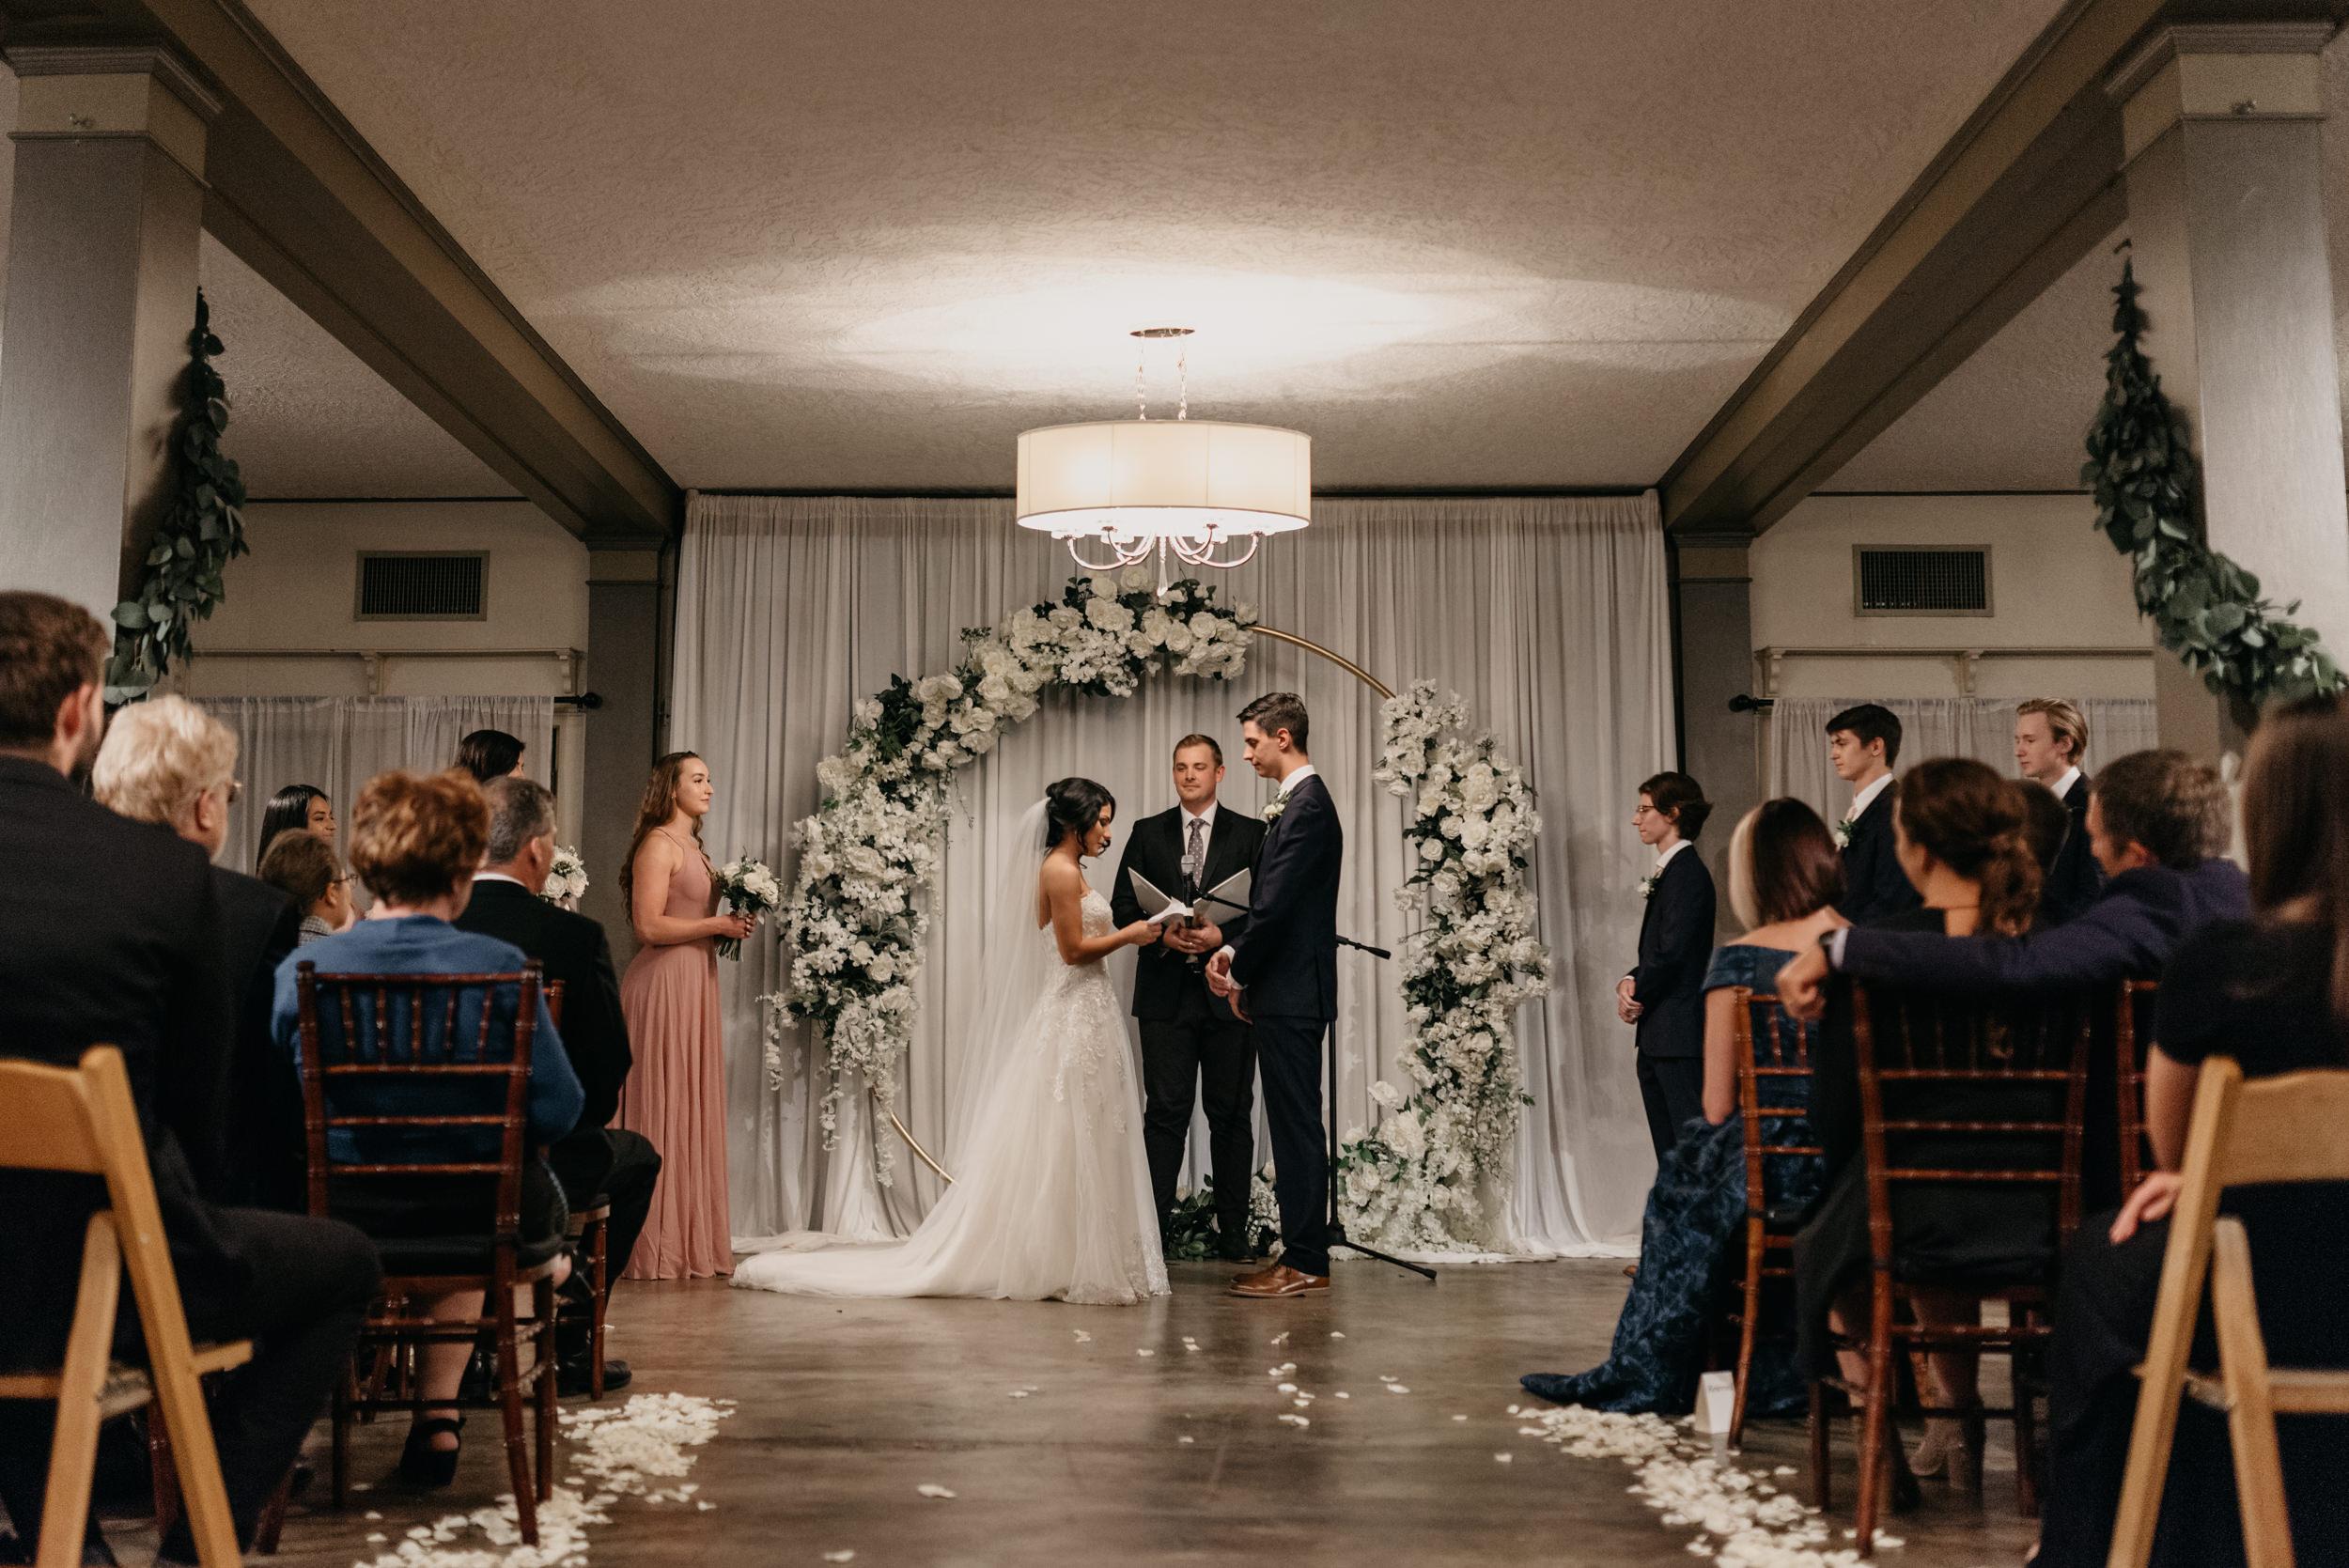 83-ceremony-west-end-ballroom-portland-wedding-venue-7969.jpg